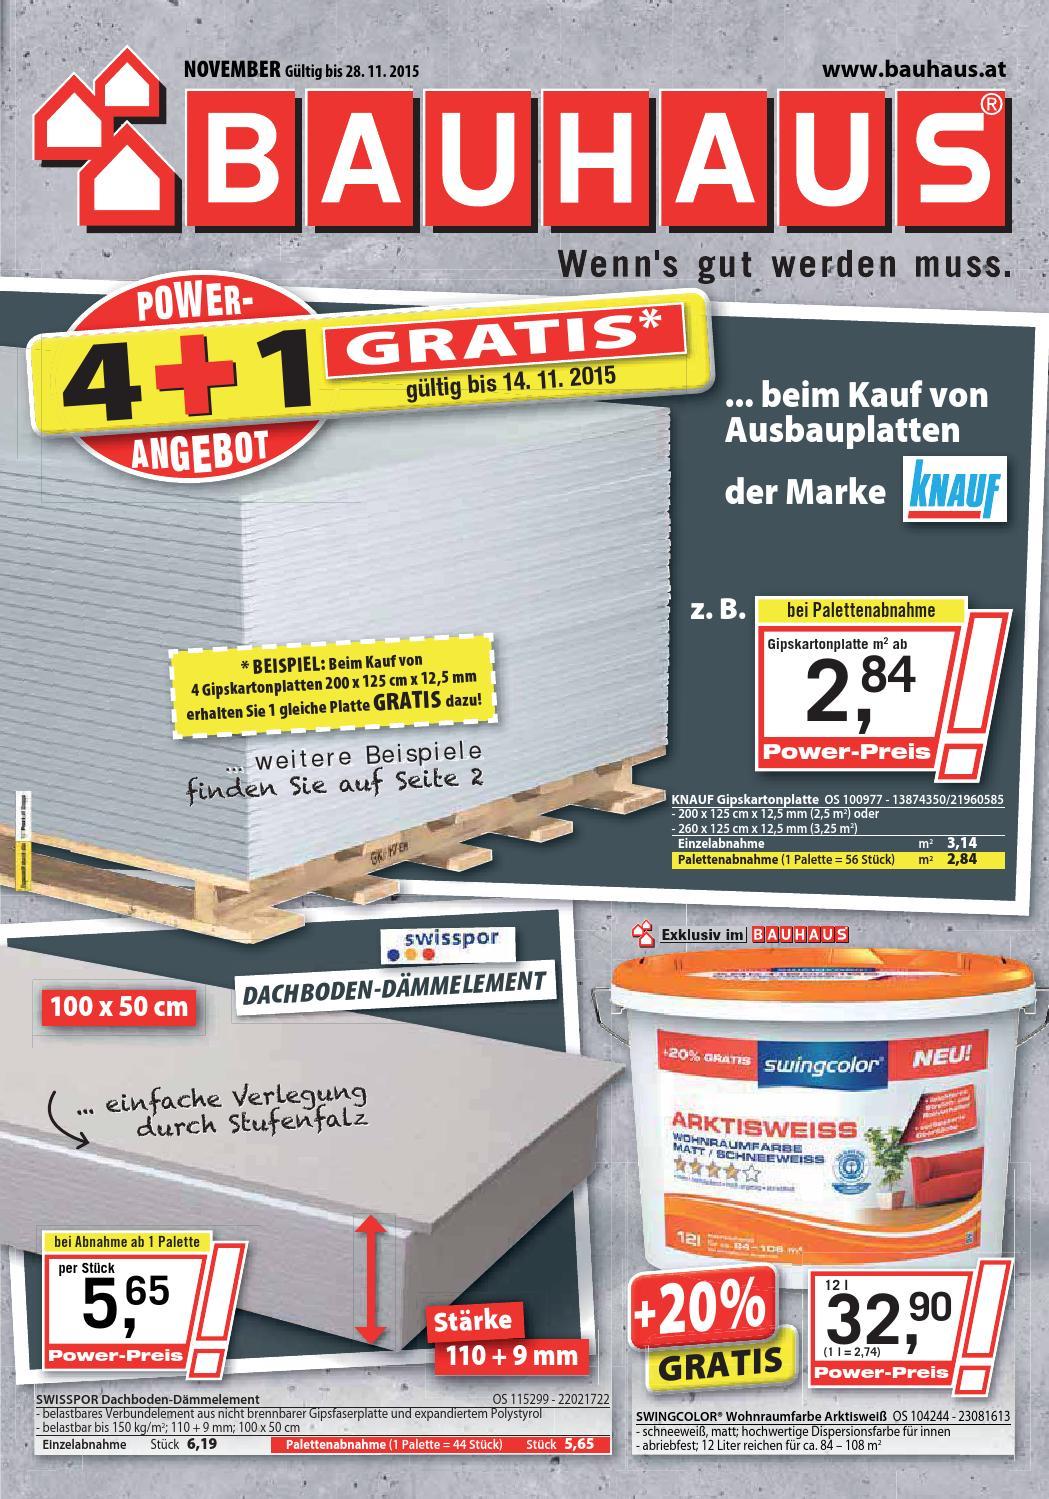 Bauhaus Angebote 1 28november2015 By Promoangeboteat Issuu